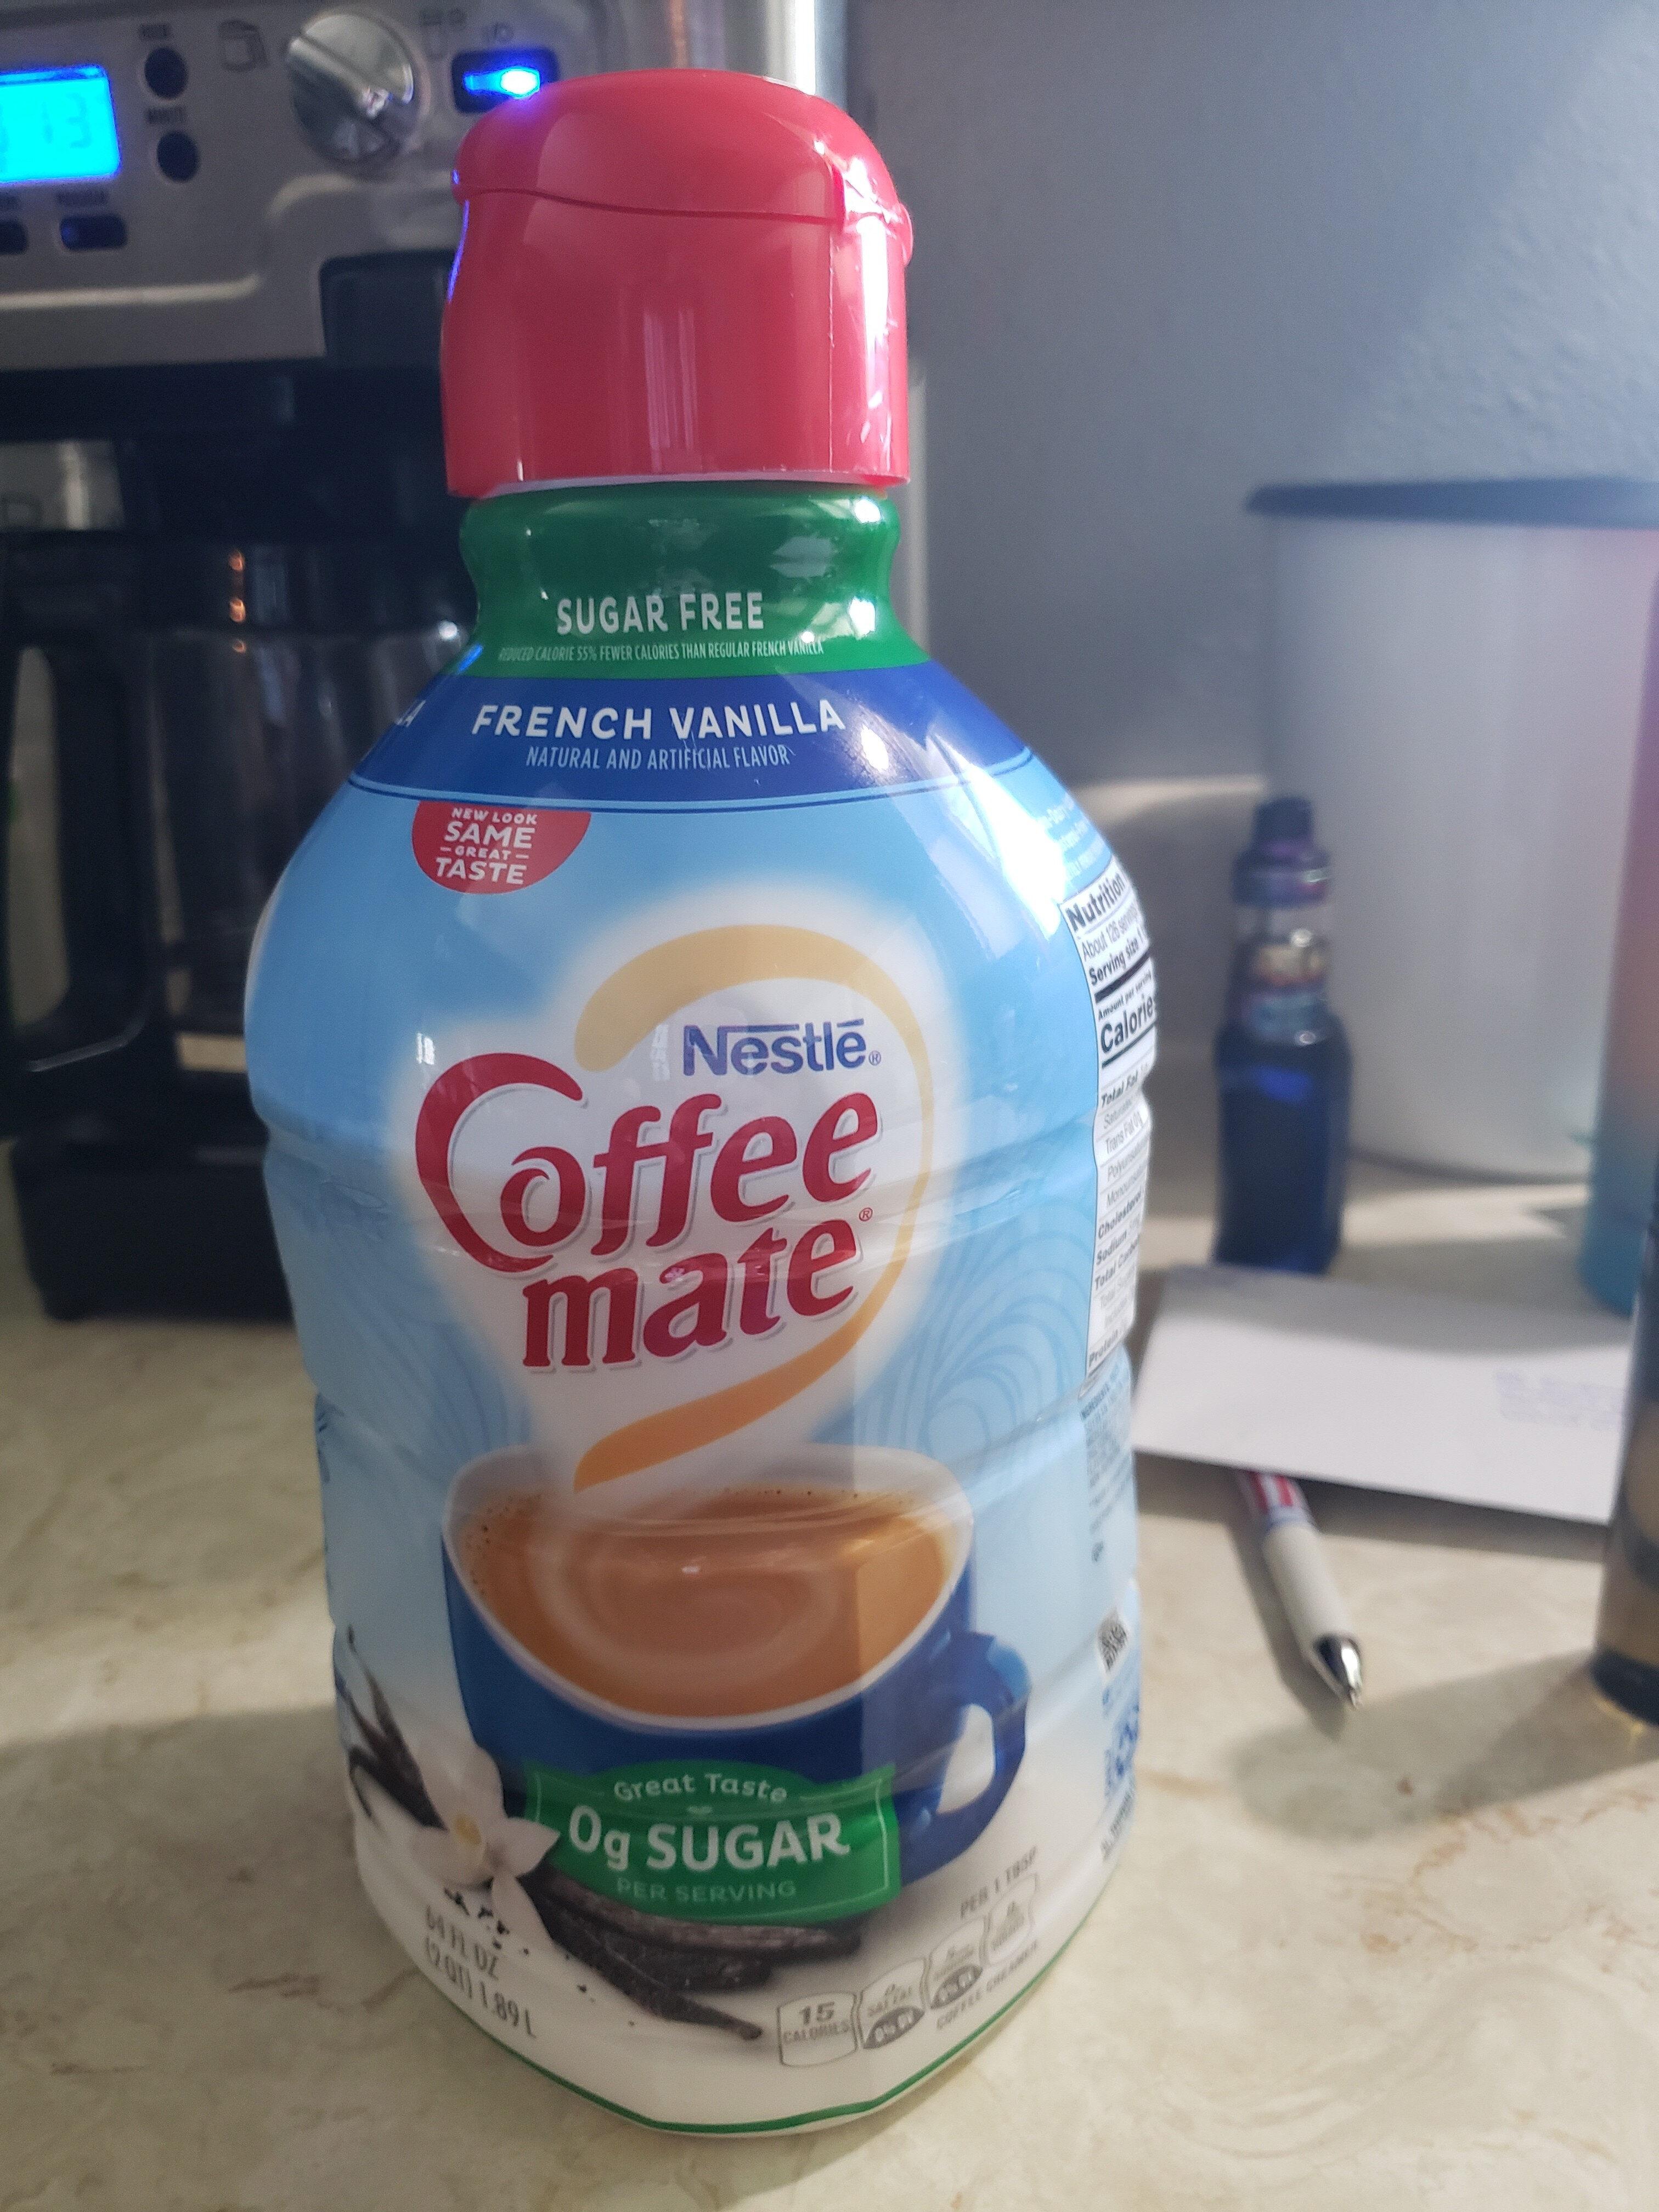 Sugar free french vanilla coffee creamer - Product - en